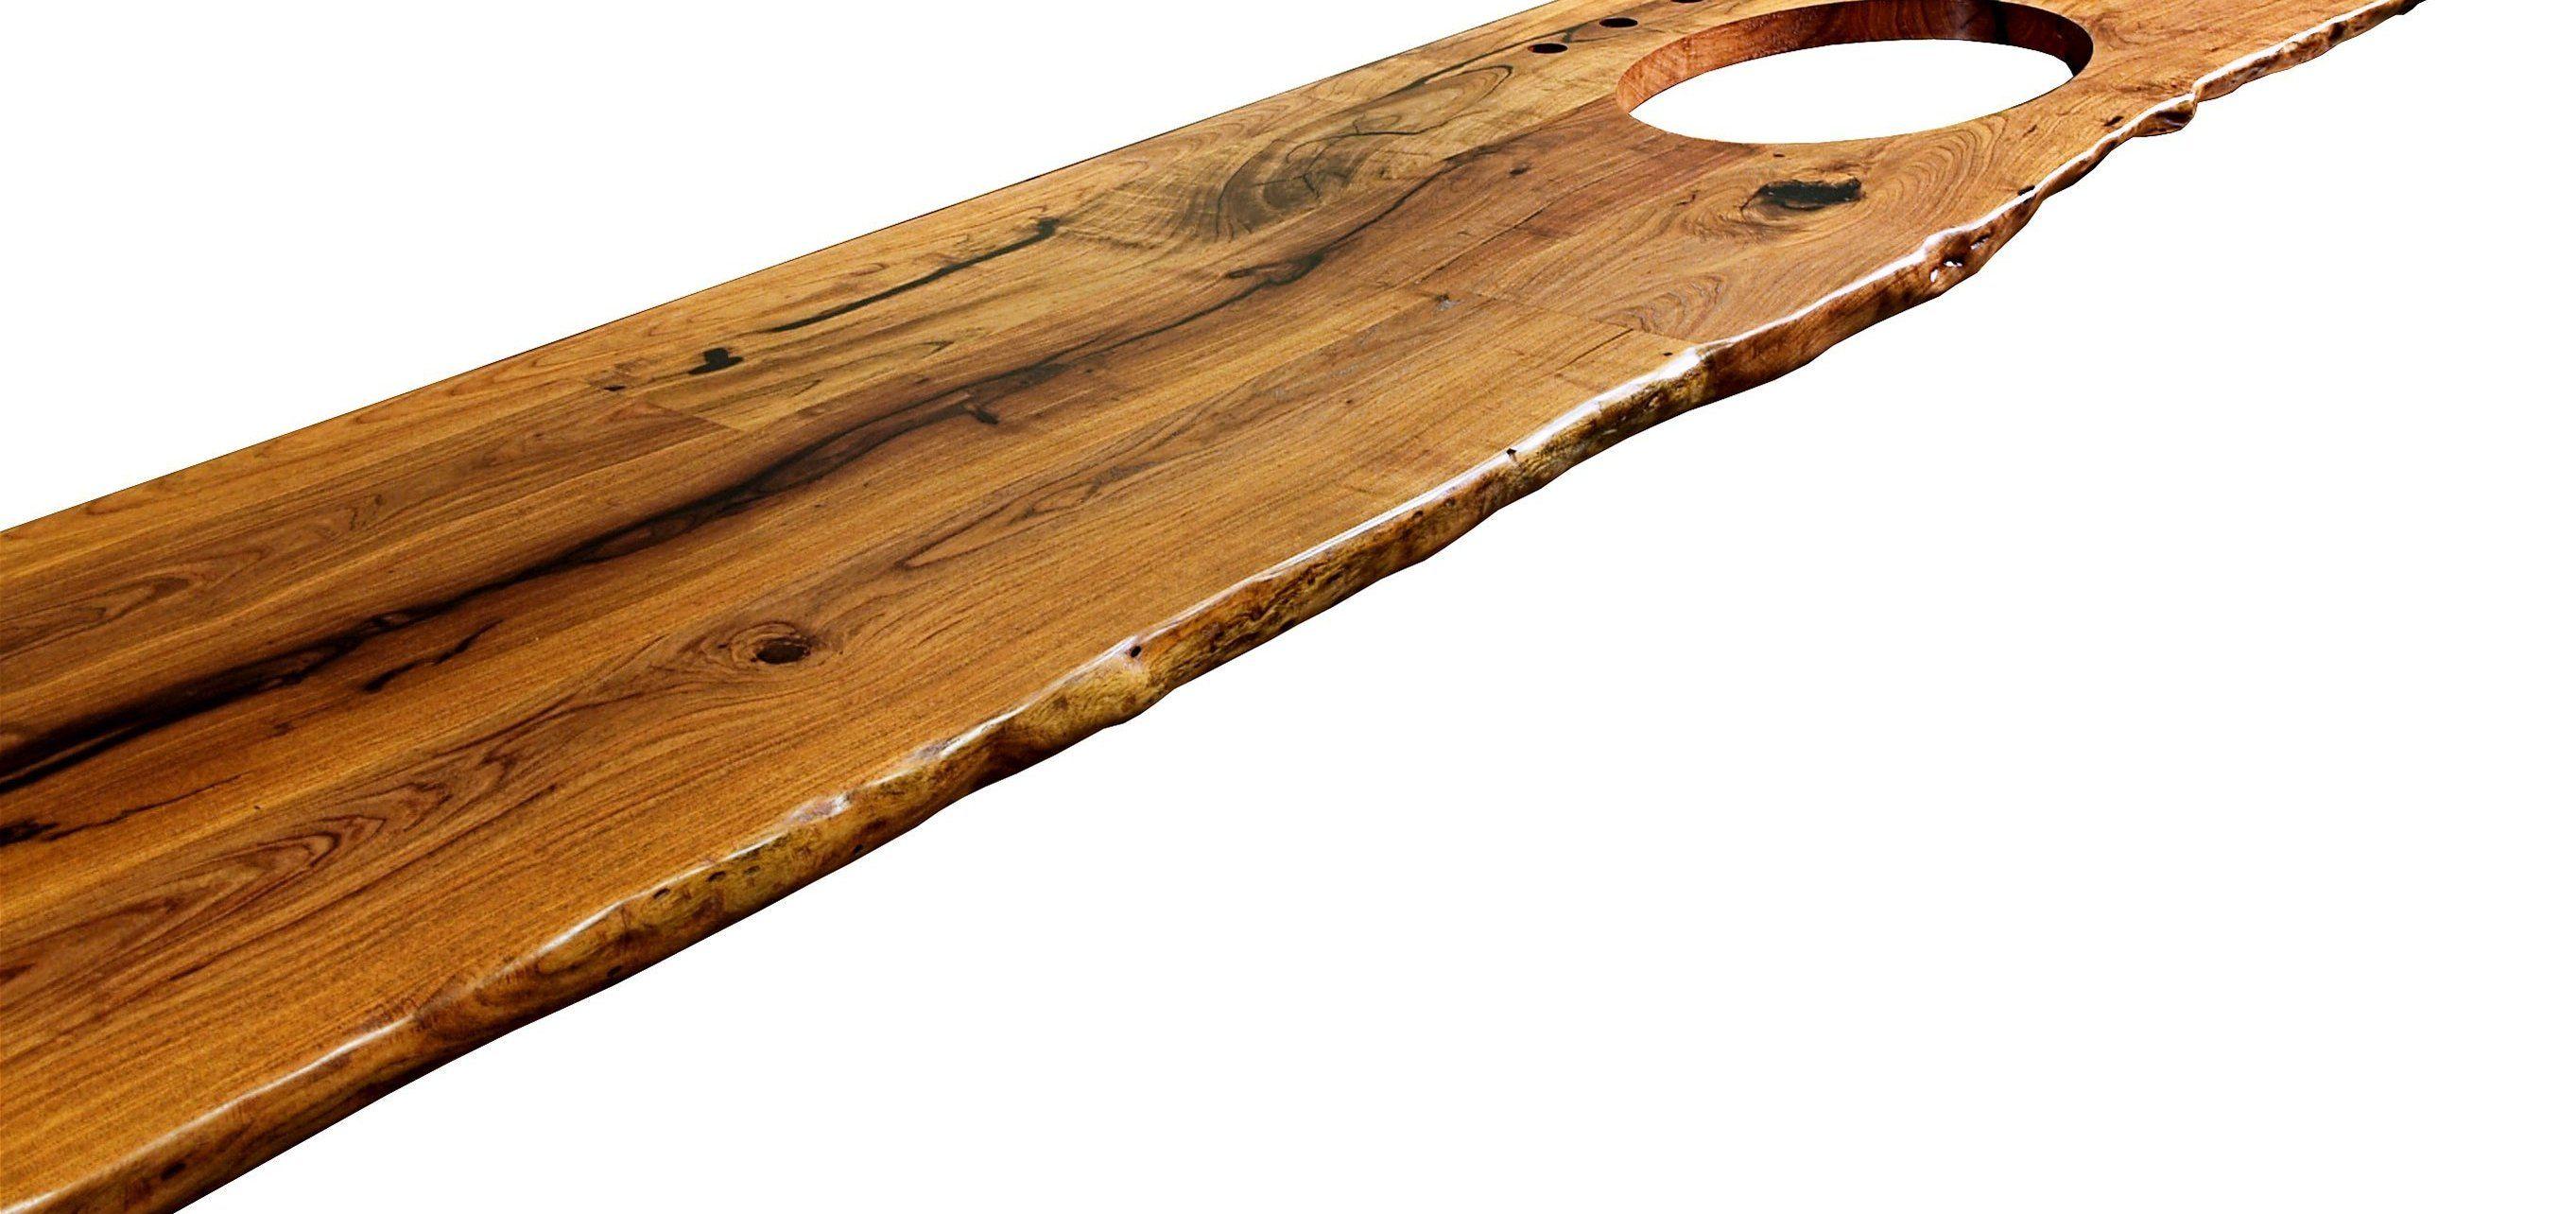 Natural Edges Wane Edges On Custom Wood Countertops And